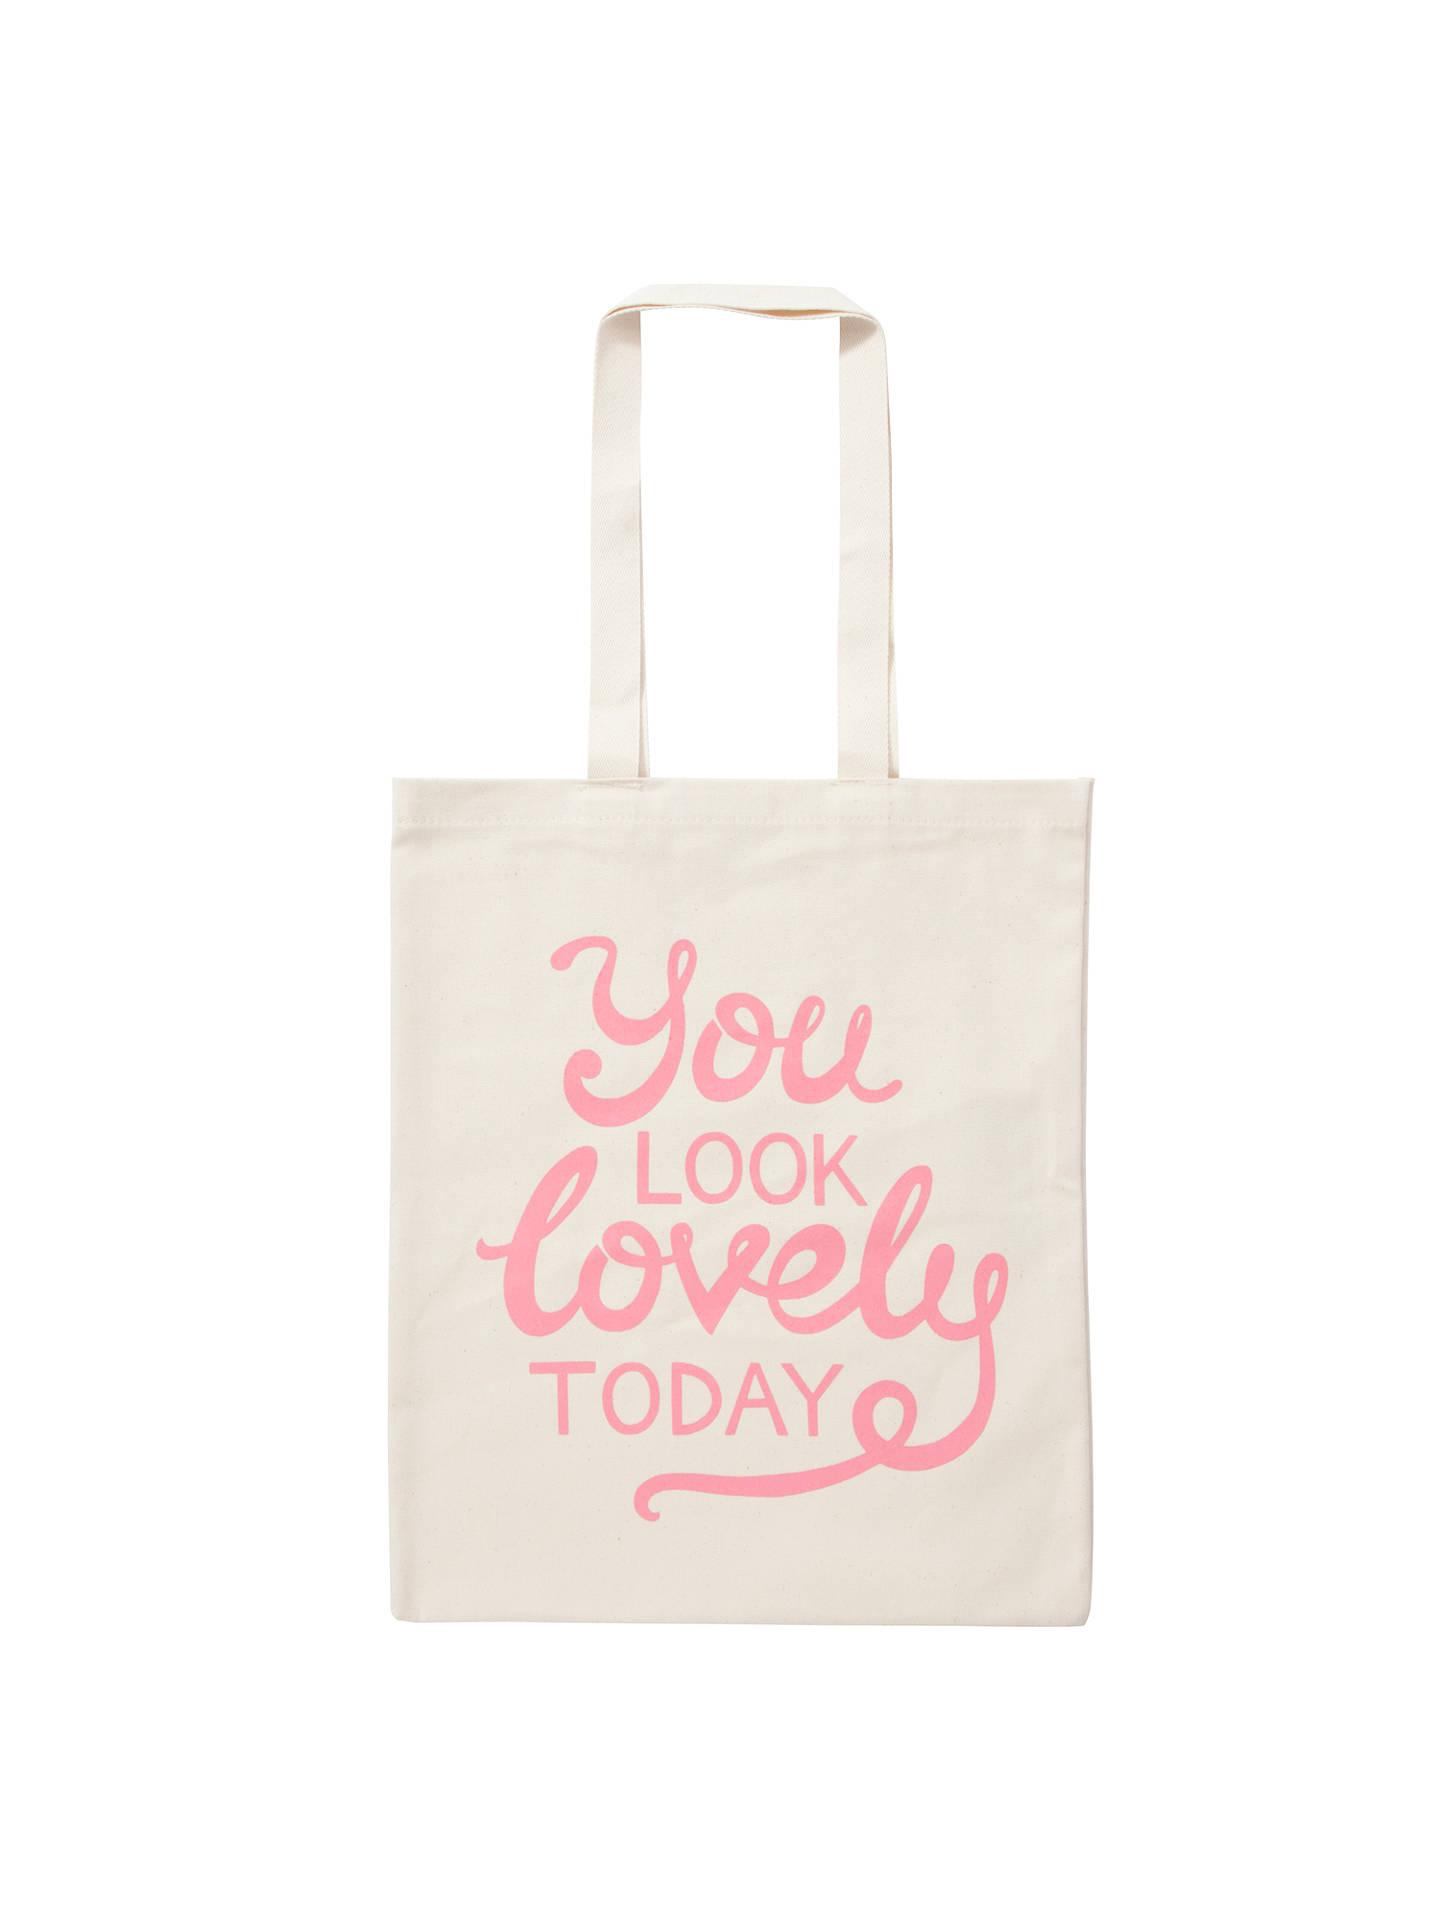 edb7c34d5 BuyAlphabet Bags Canvas Shopper Bag, You Look Lovely Online at  johnlewis.com ...